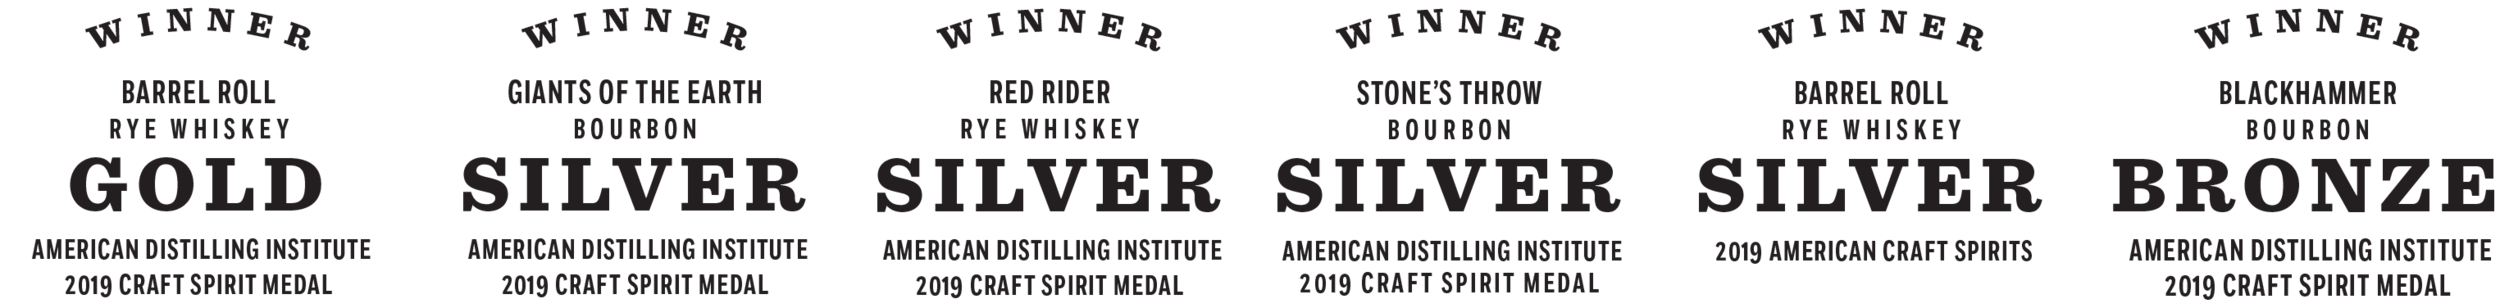 2019 Award Medals.png